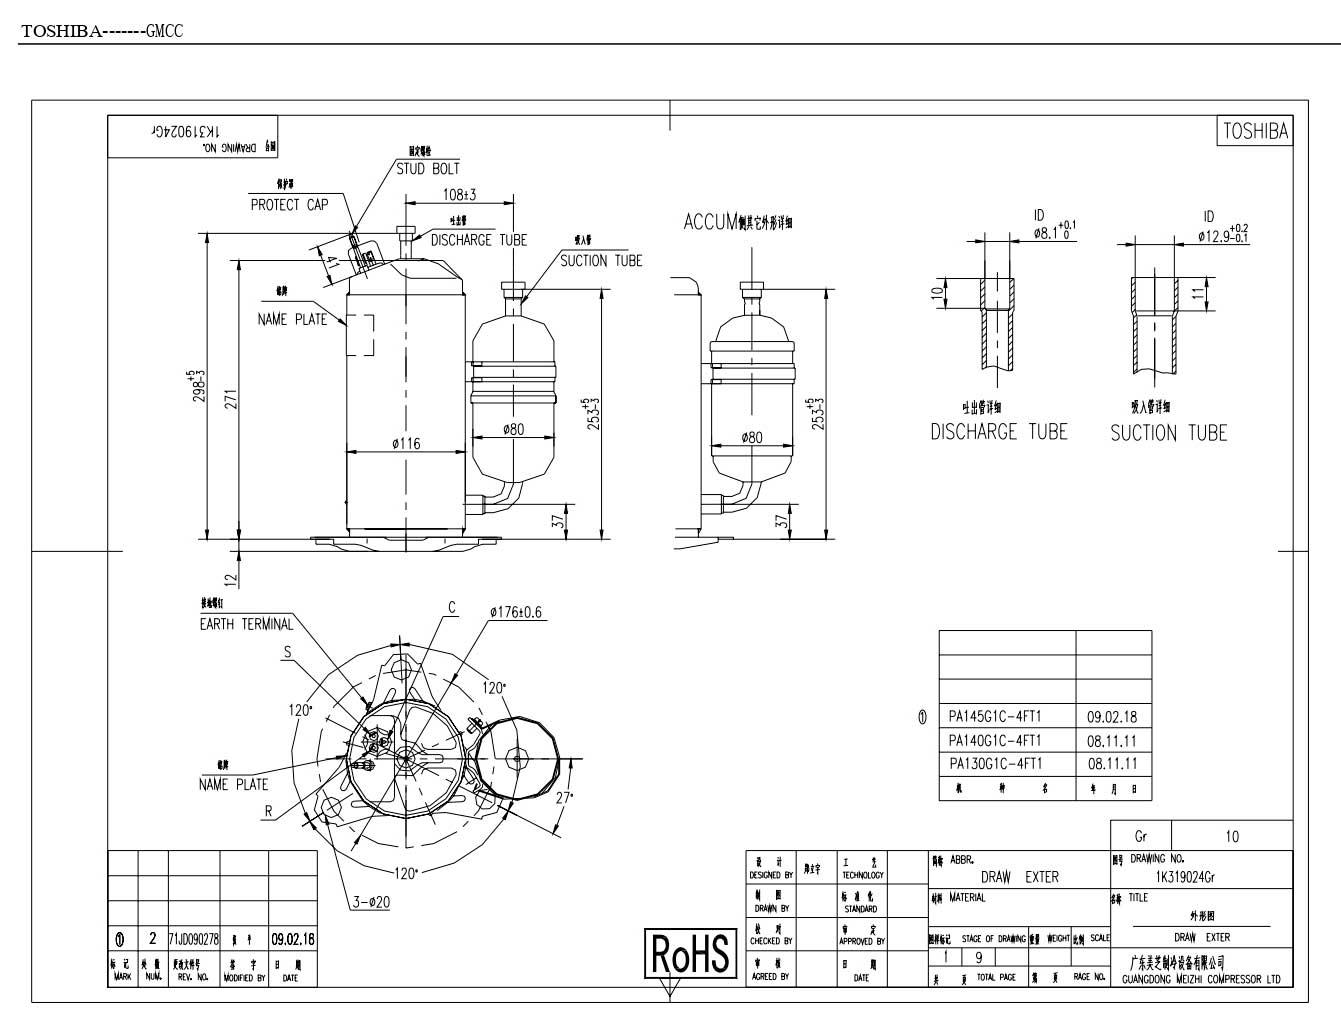 GMCC PA140G1C-4DZ1 характеристики